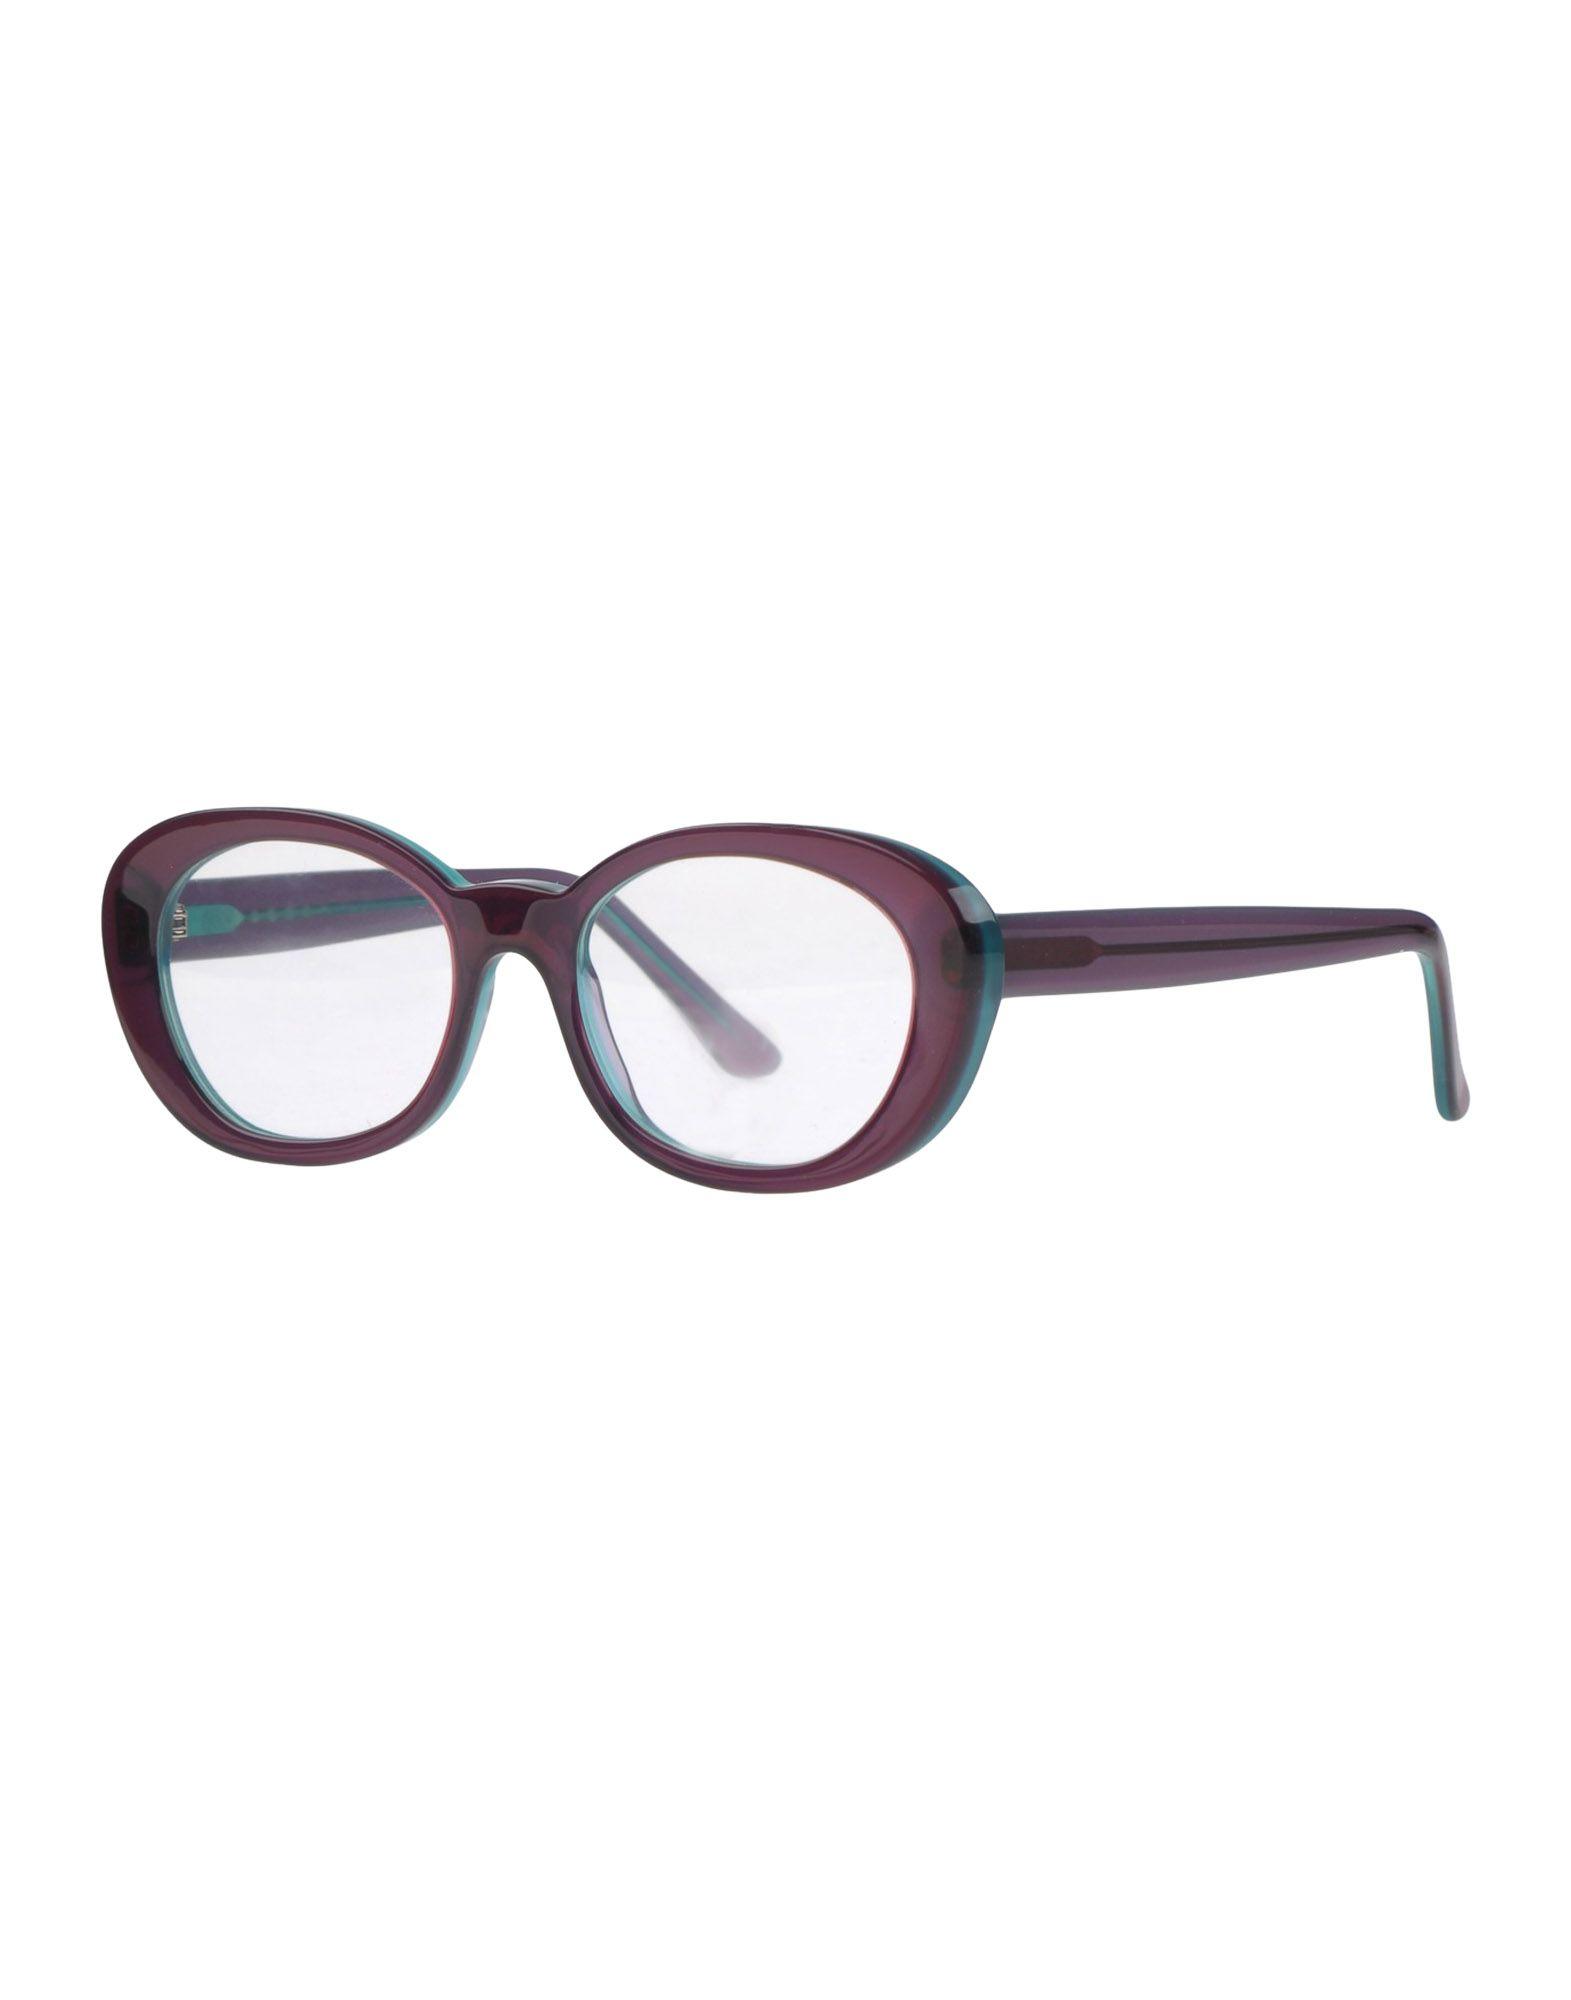 MARNI Damen Brille Farbe Pflaume Größe 1